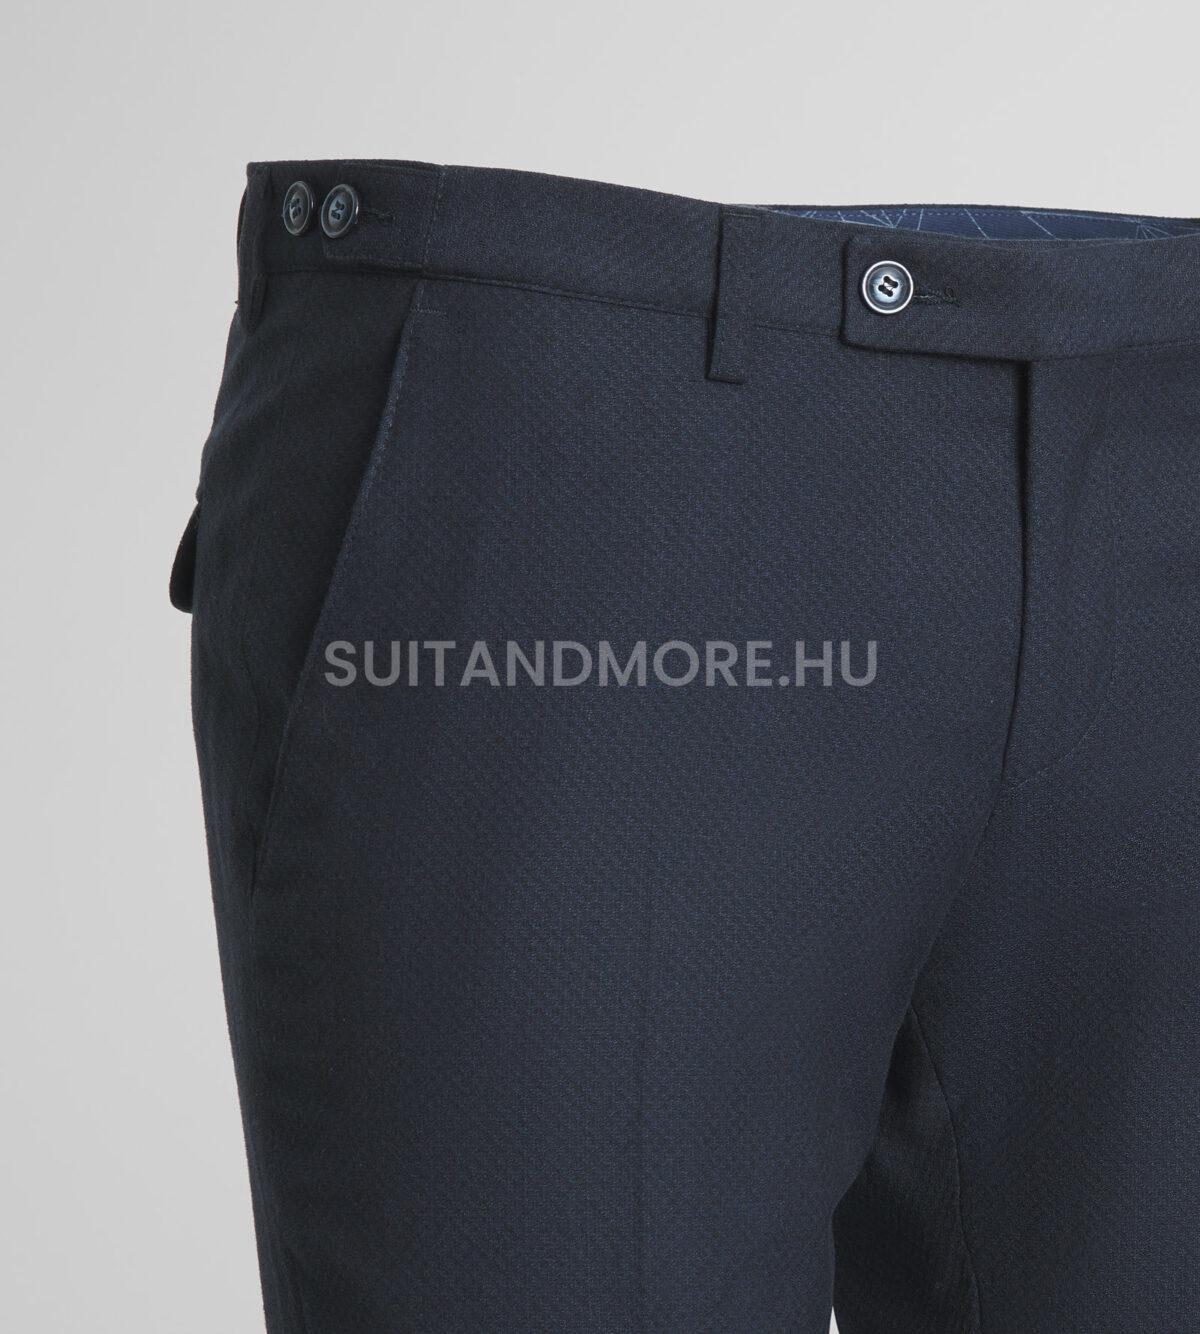 sötétkék-extra-slim-fit-gyapjú-kevert-szövetnadrág-NICO-1261188-20-04